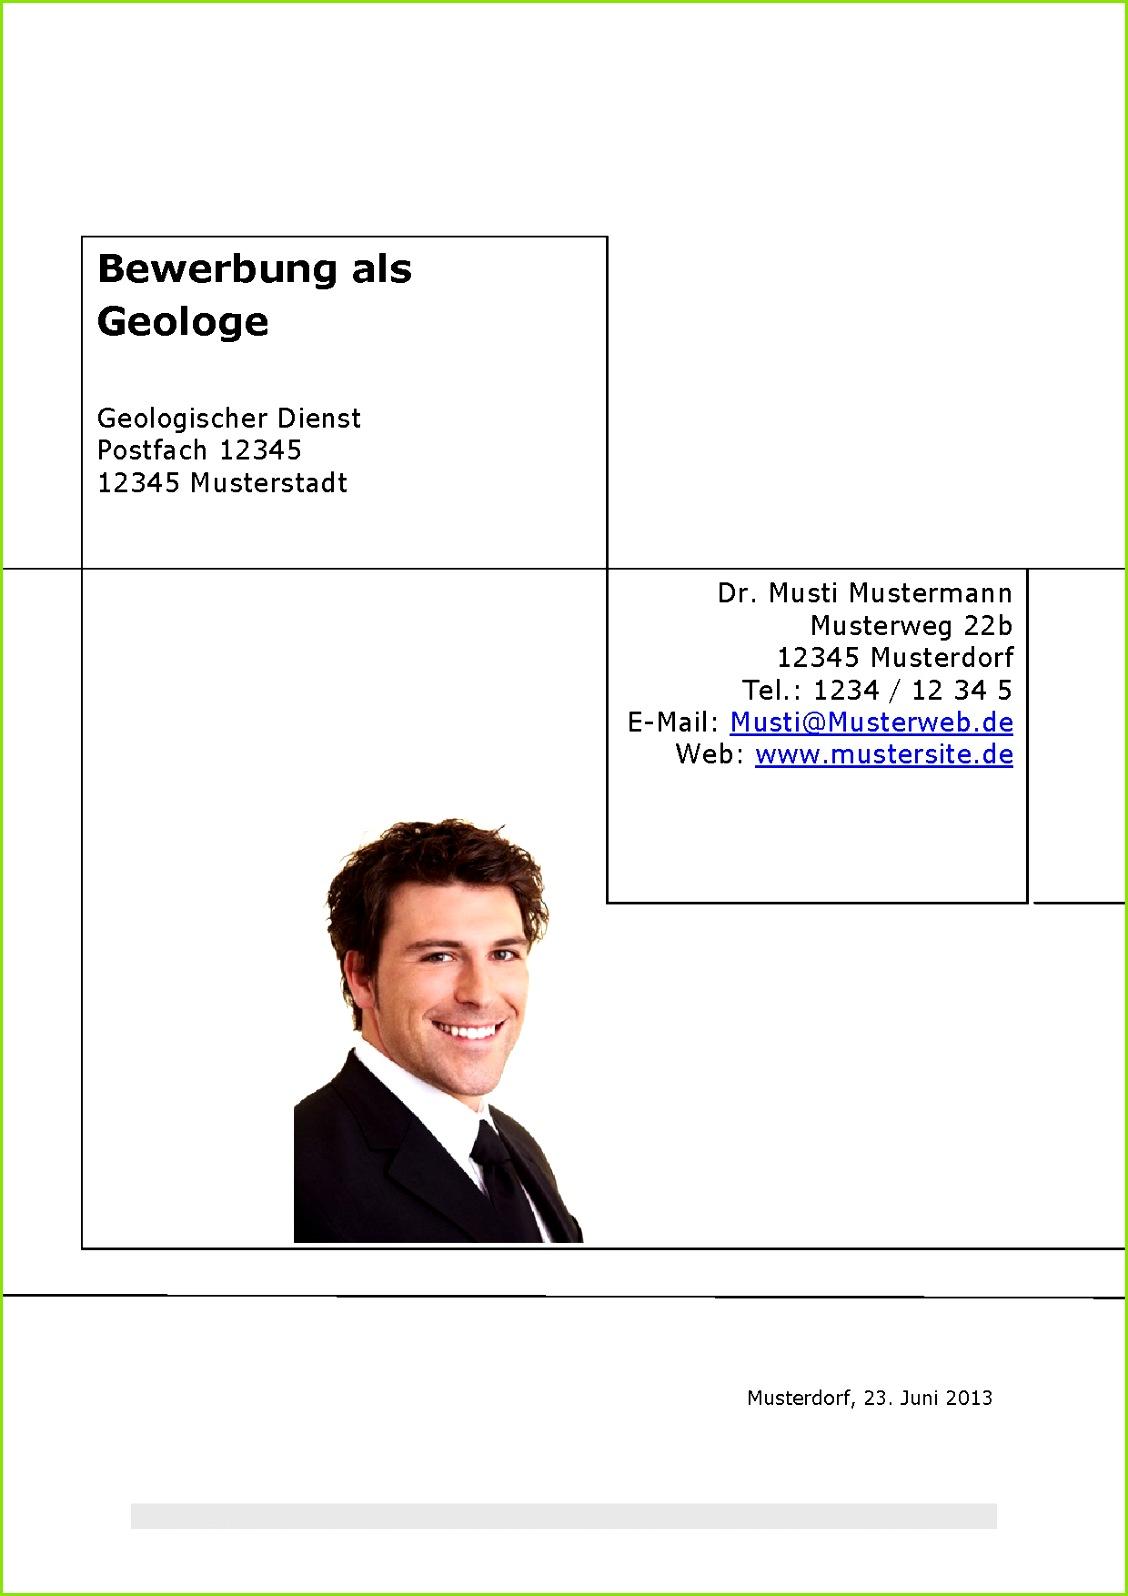 Bewerbung Deckblatt Vorlage Pdf 9604 Elegant Bewerbung Deckblatt Vorlage Pdf Von